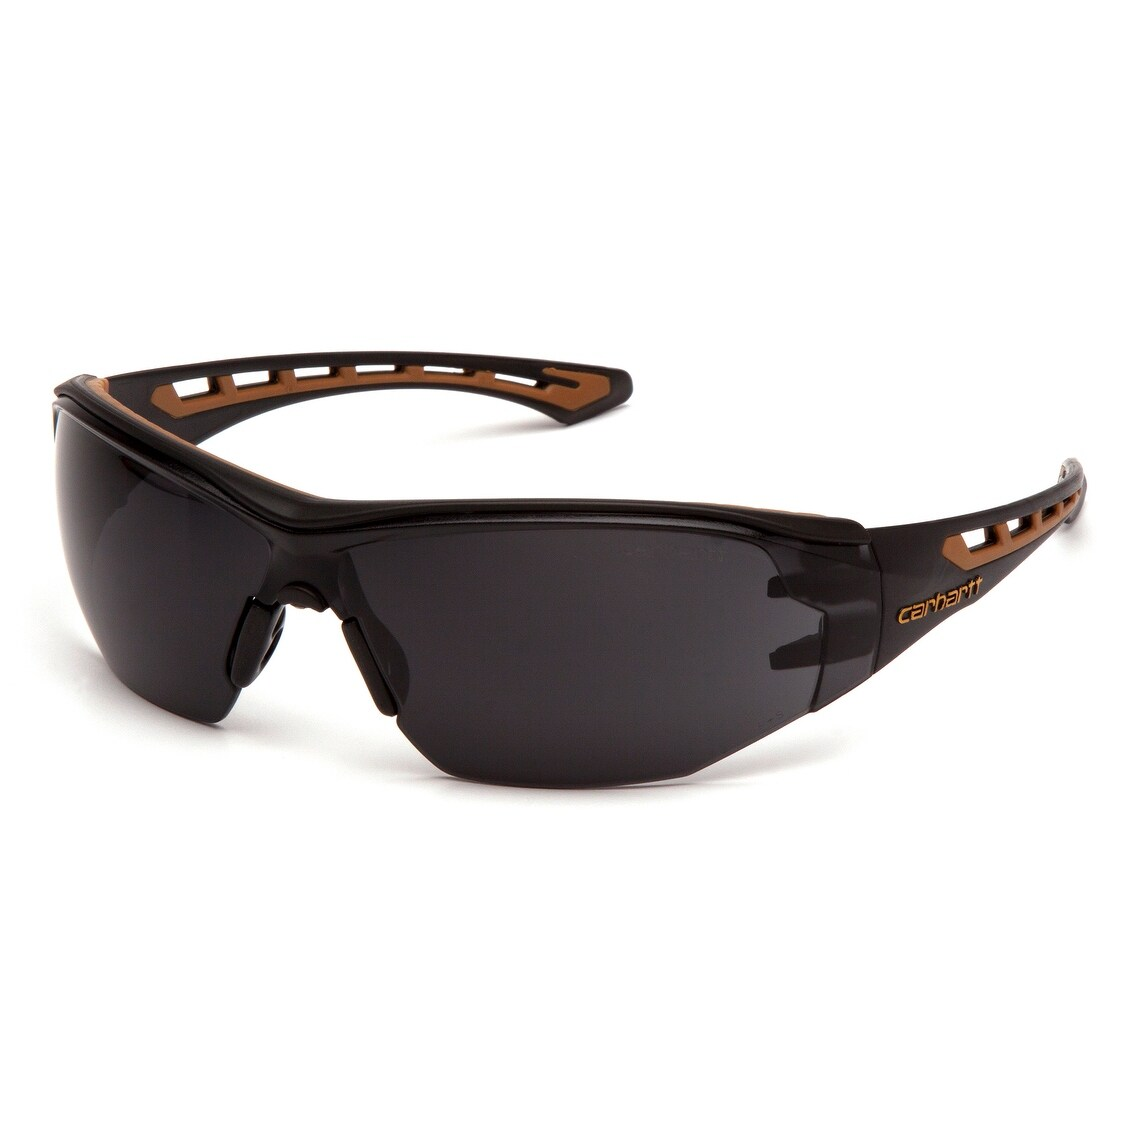 Carhartt CHB820ST Easley Gray Anti-Fog Lens Safety Glasses with Black/Tan Frame